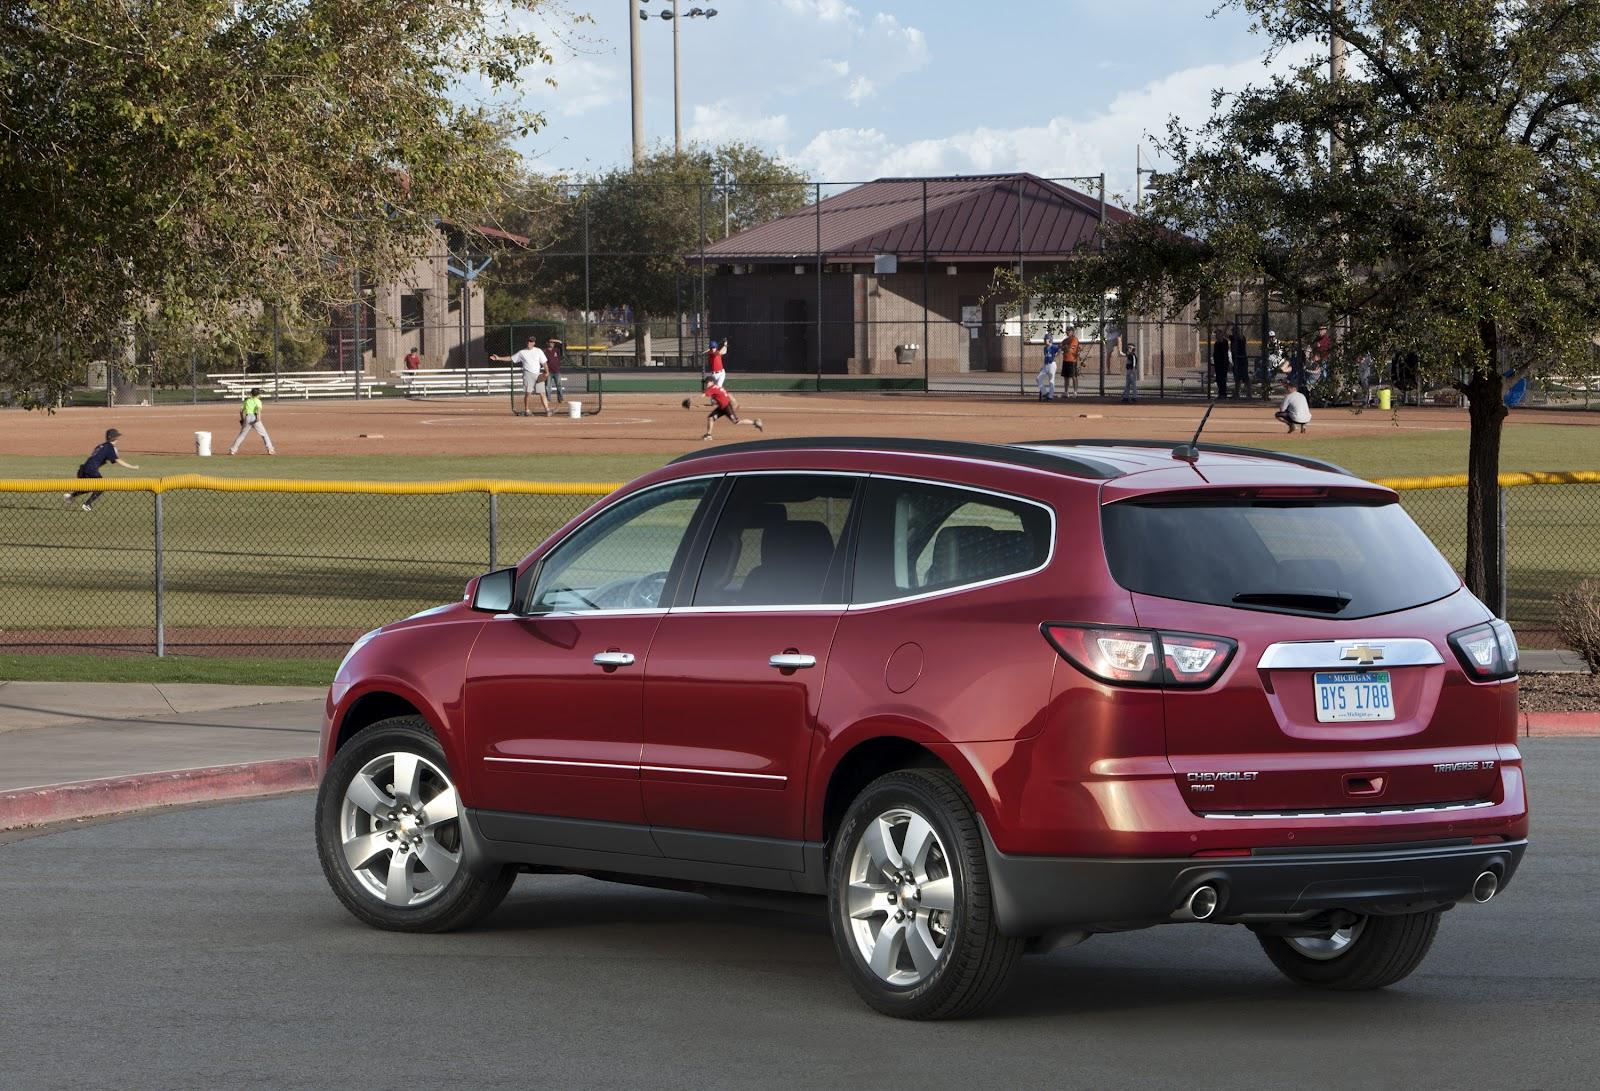 chevrolet - 2009 - [Chevrolet] traverse 2013+chevrolet+traverse+4